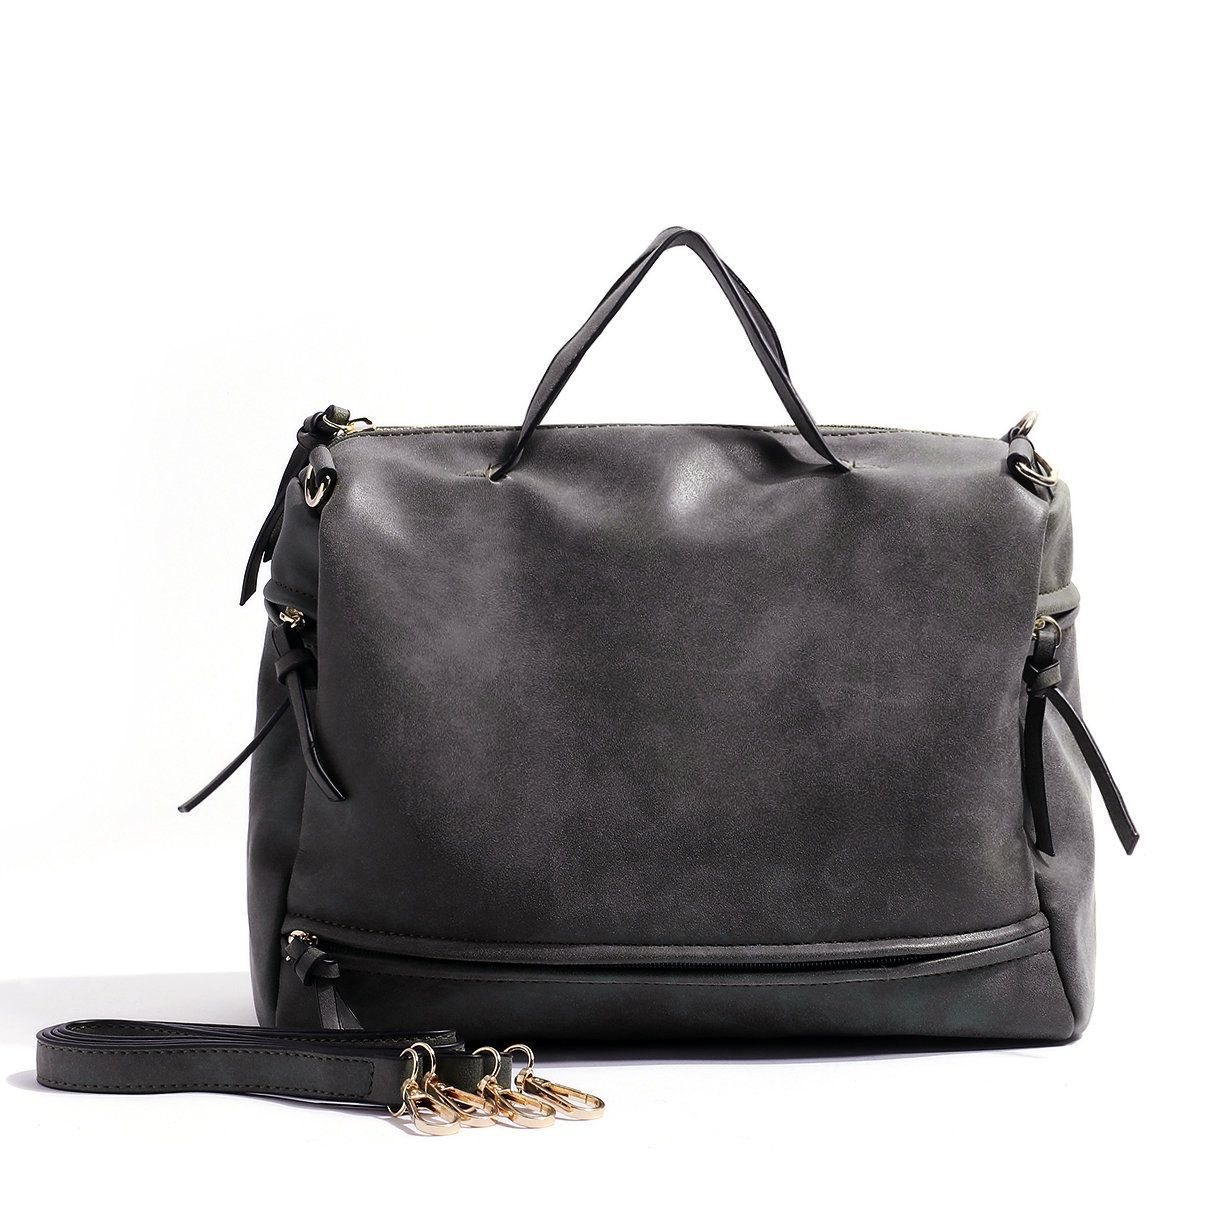 0e80445d173d Dark Grey Nubuck Leather Handbag   Burberry handbags in 2018 ...